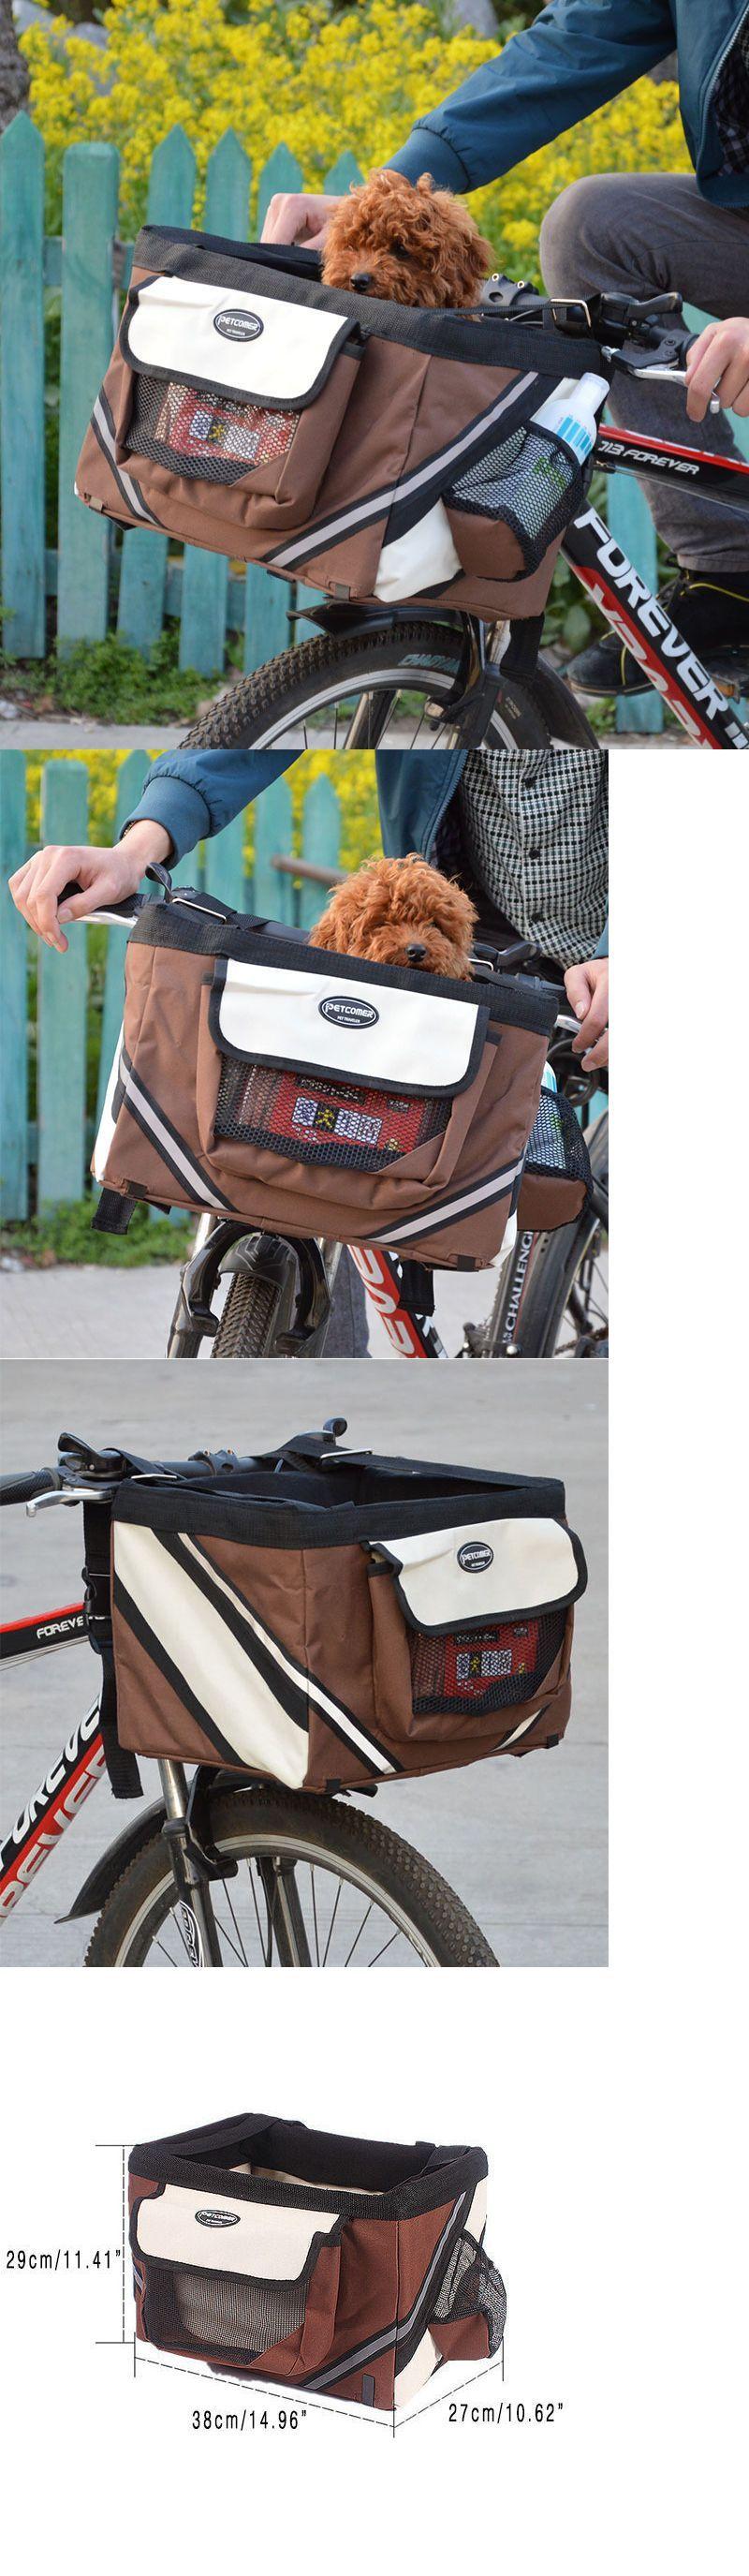 Bike baskets and trailers pet cat dog bike basket bag travel